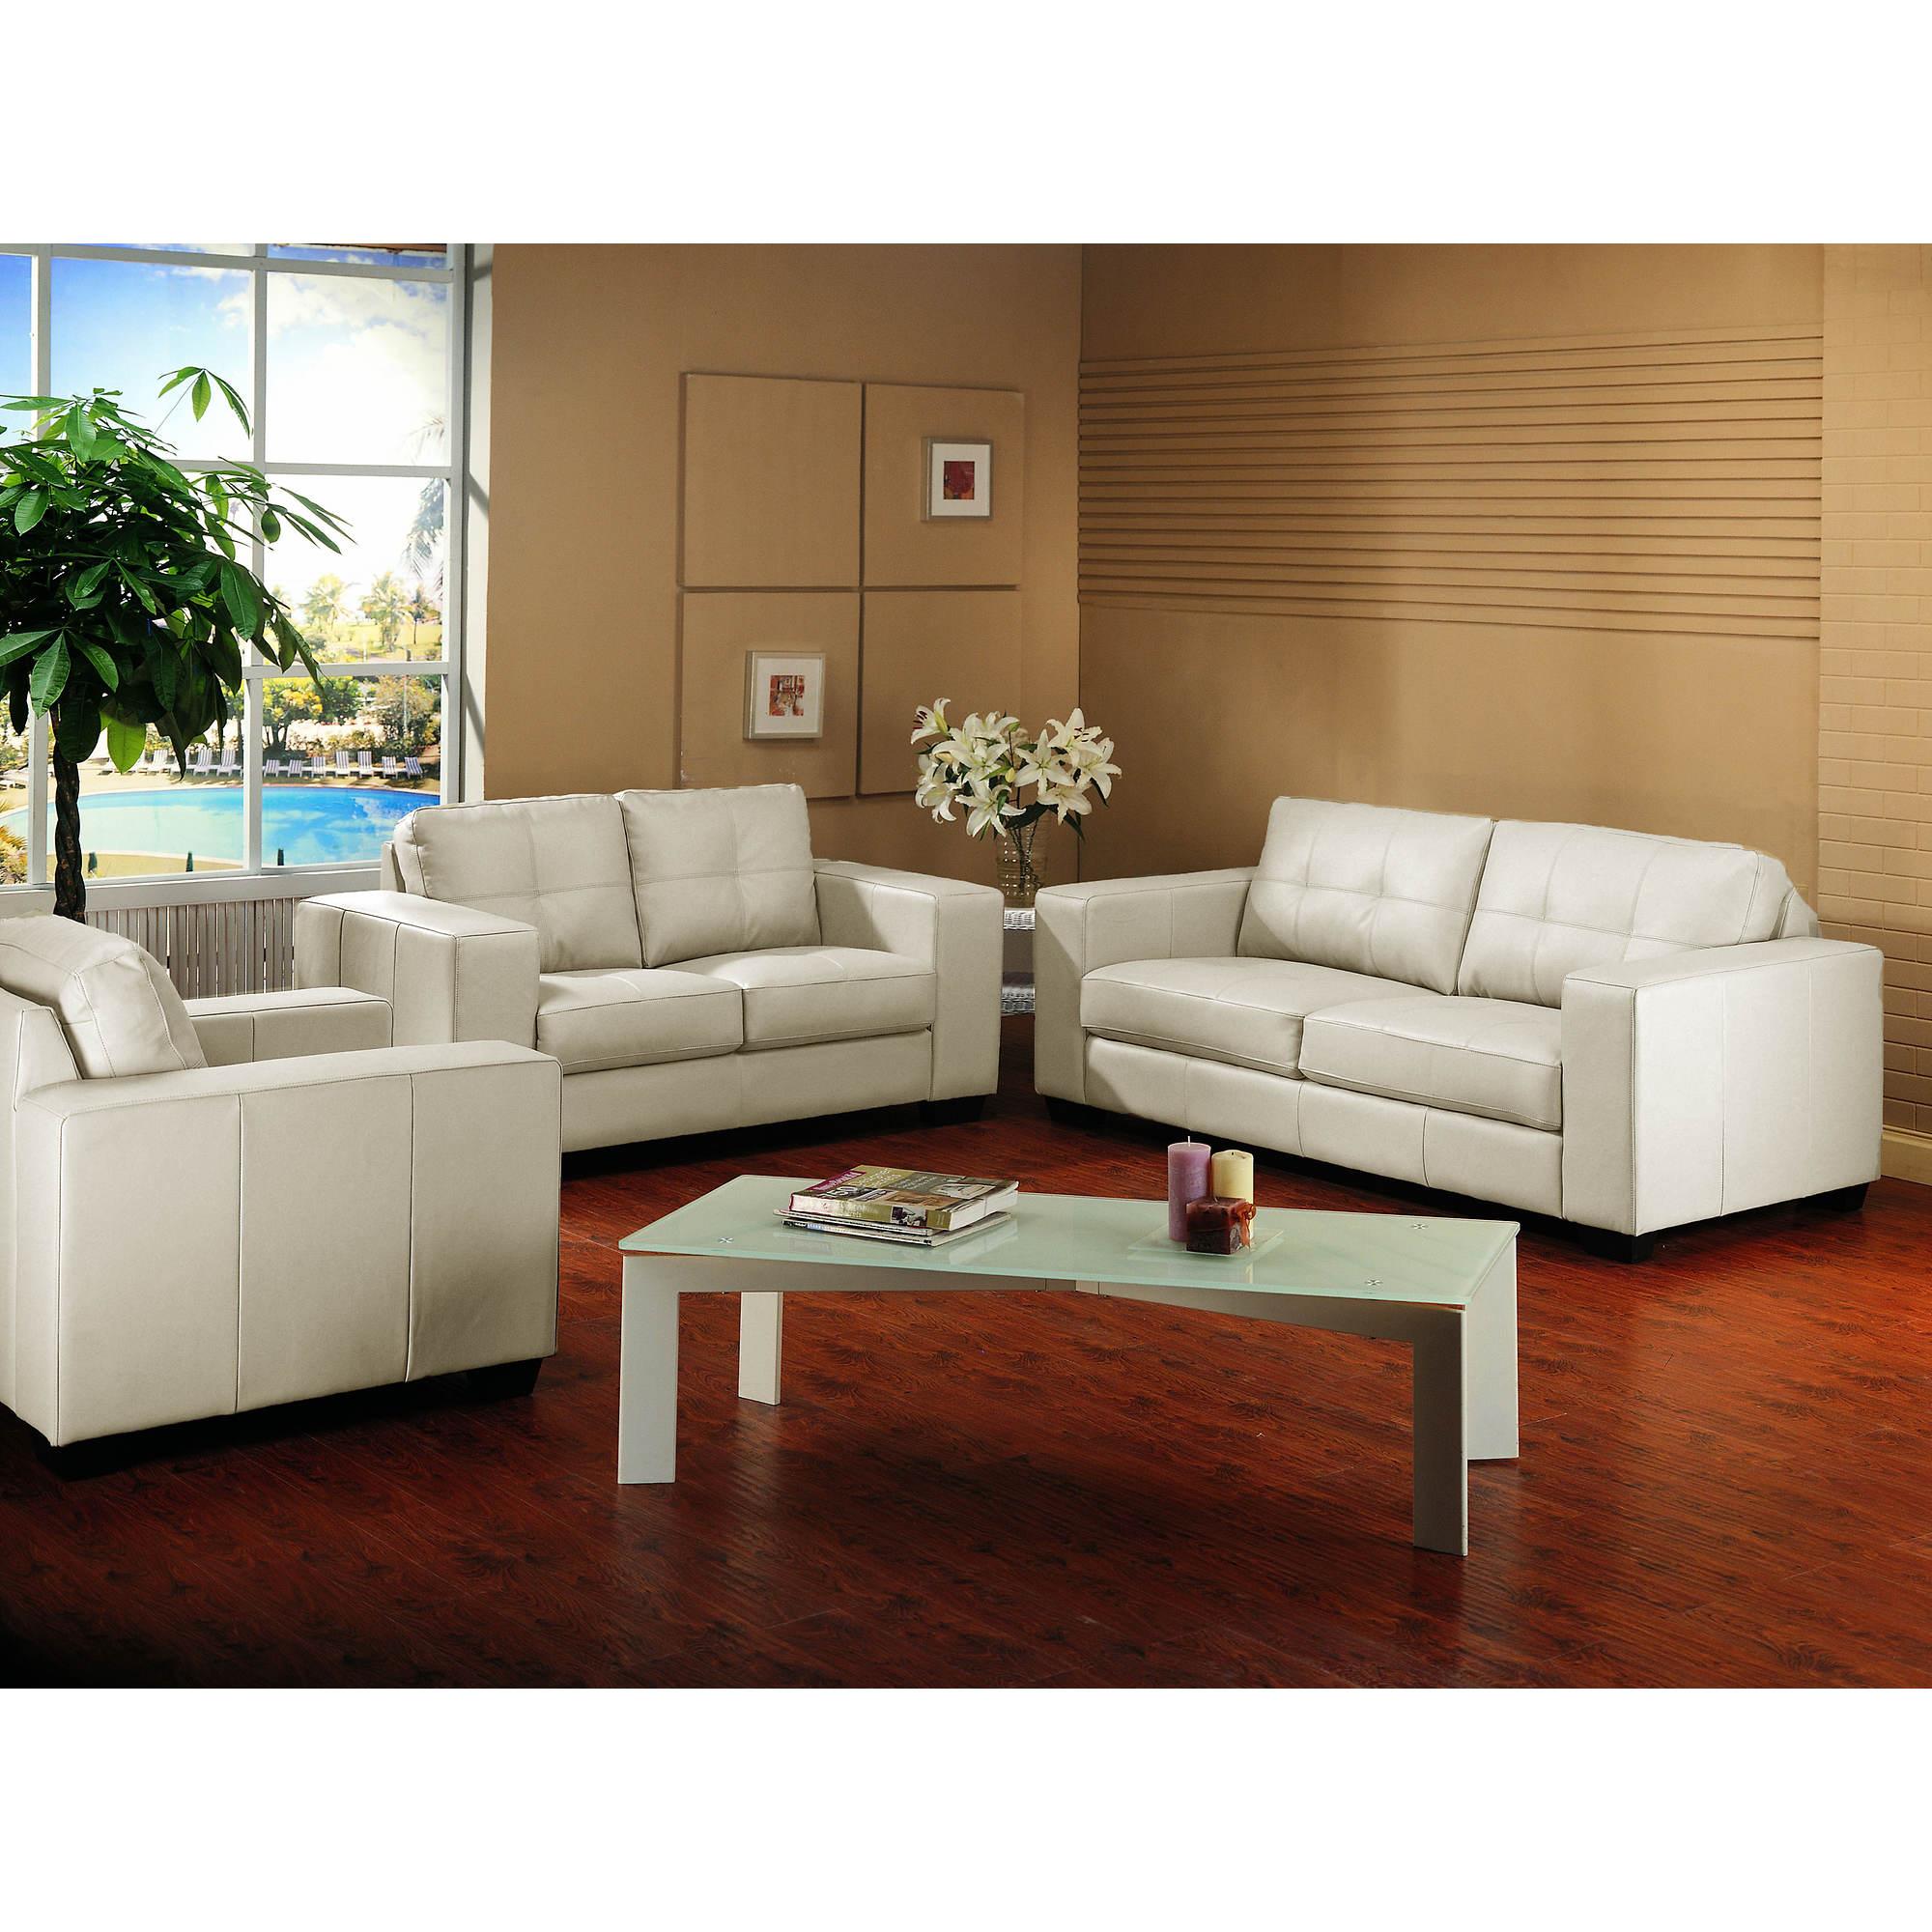 Ivory Leather Living Room Sets